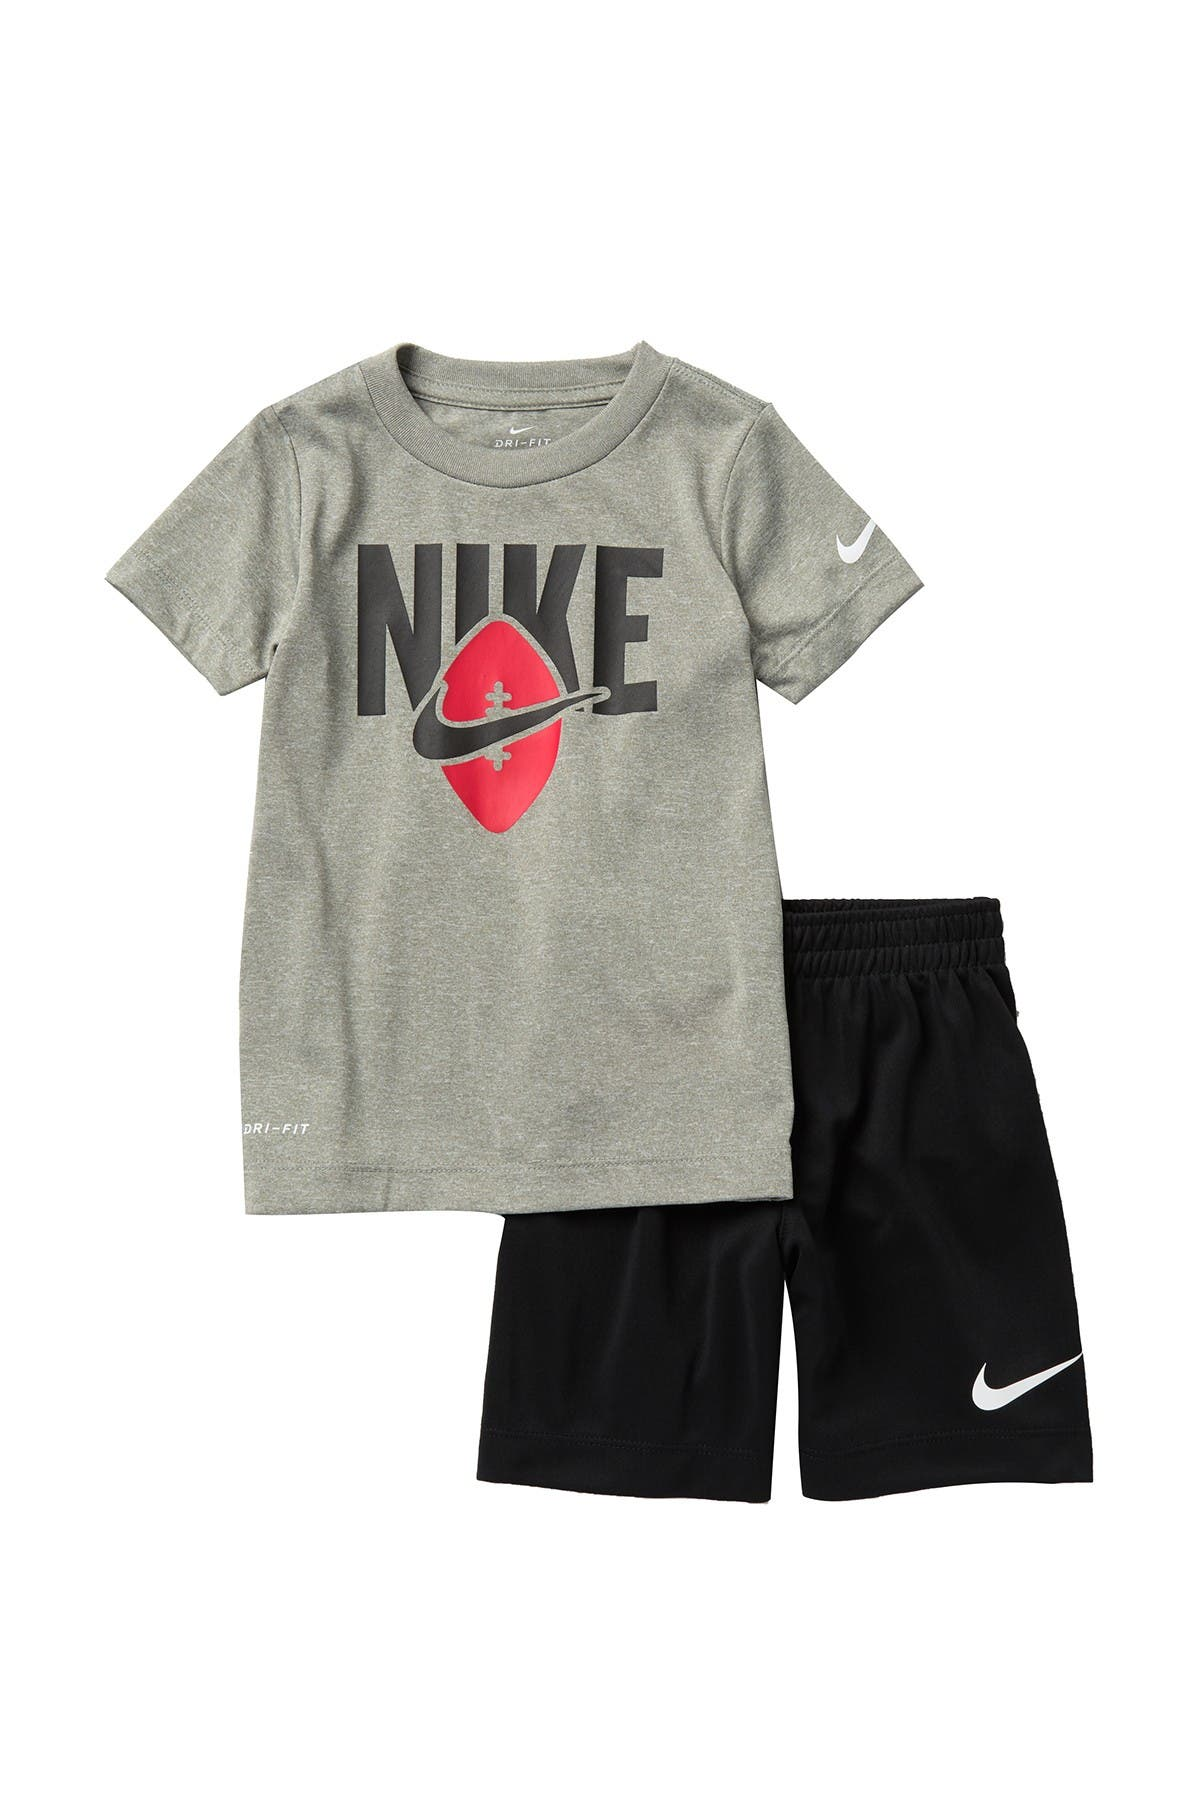 Image of Nike NKB Sport T-Shirt & Shorts Set